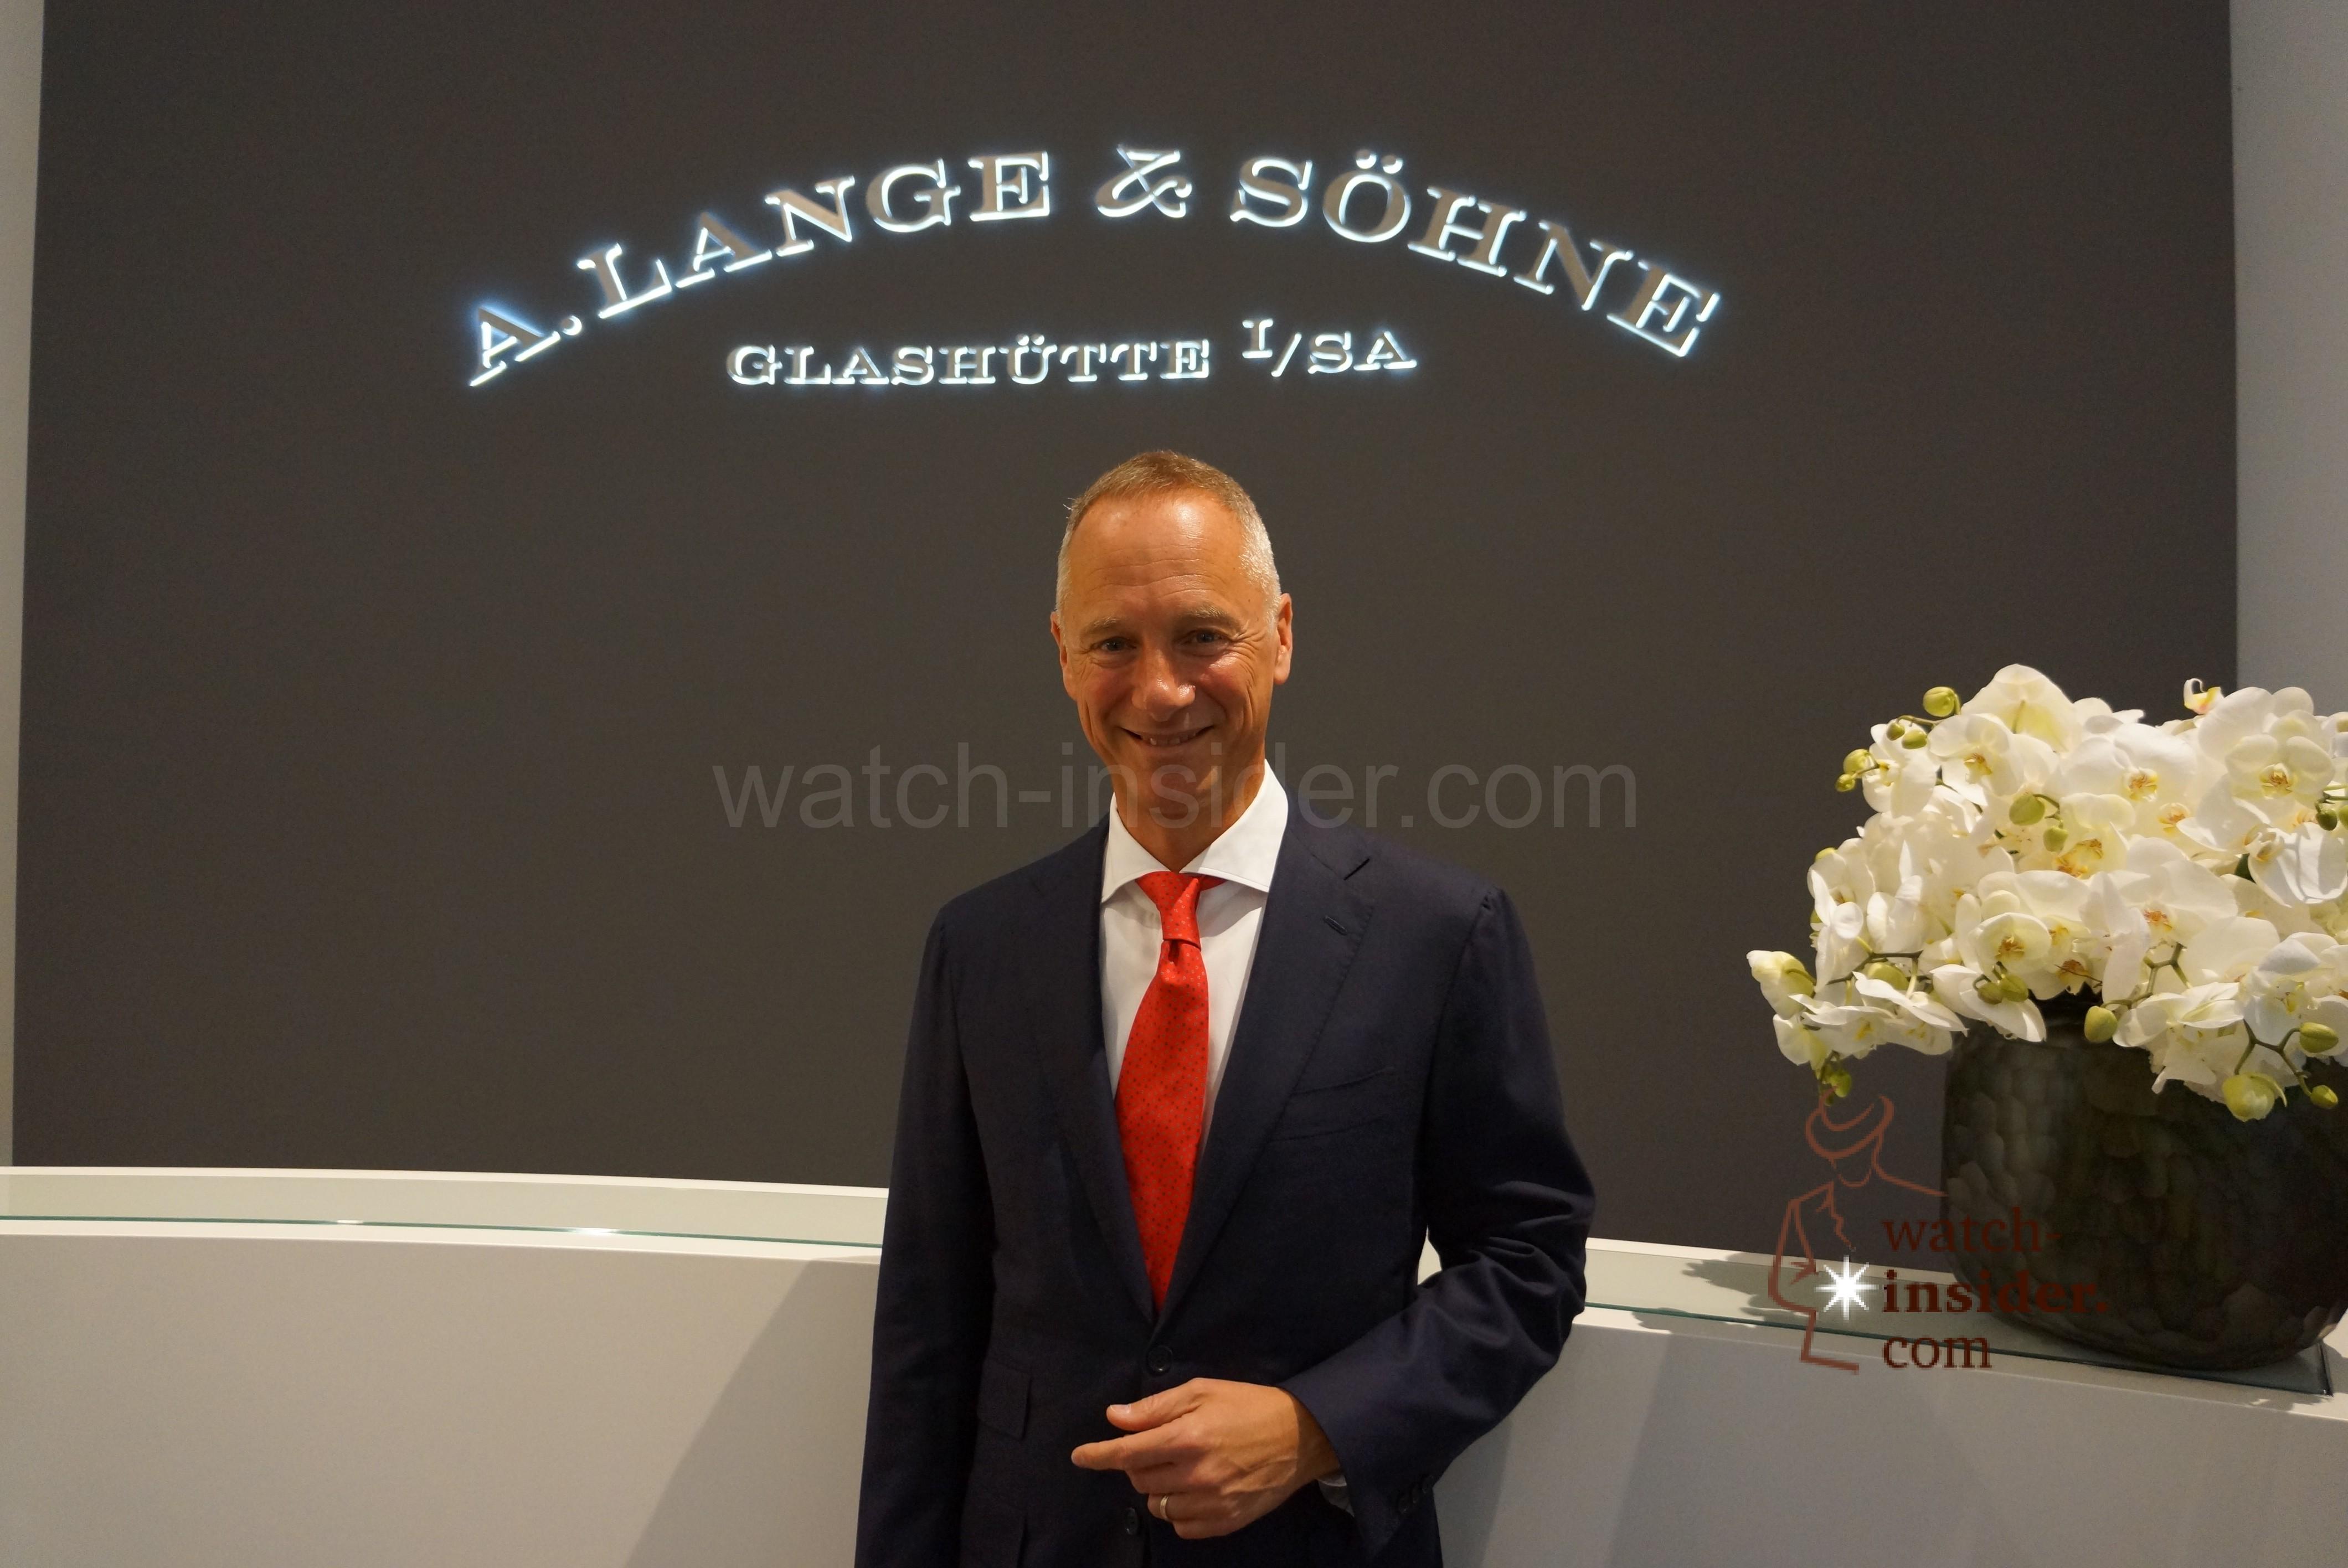 Wilhelm Schmid CEO of A. Lange & Söhne